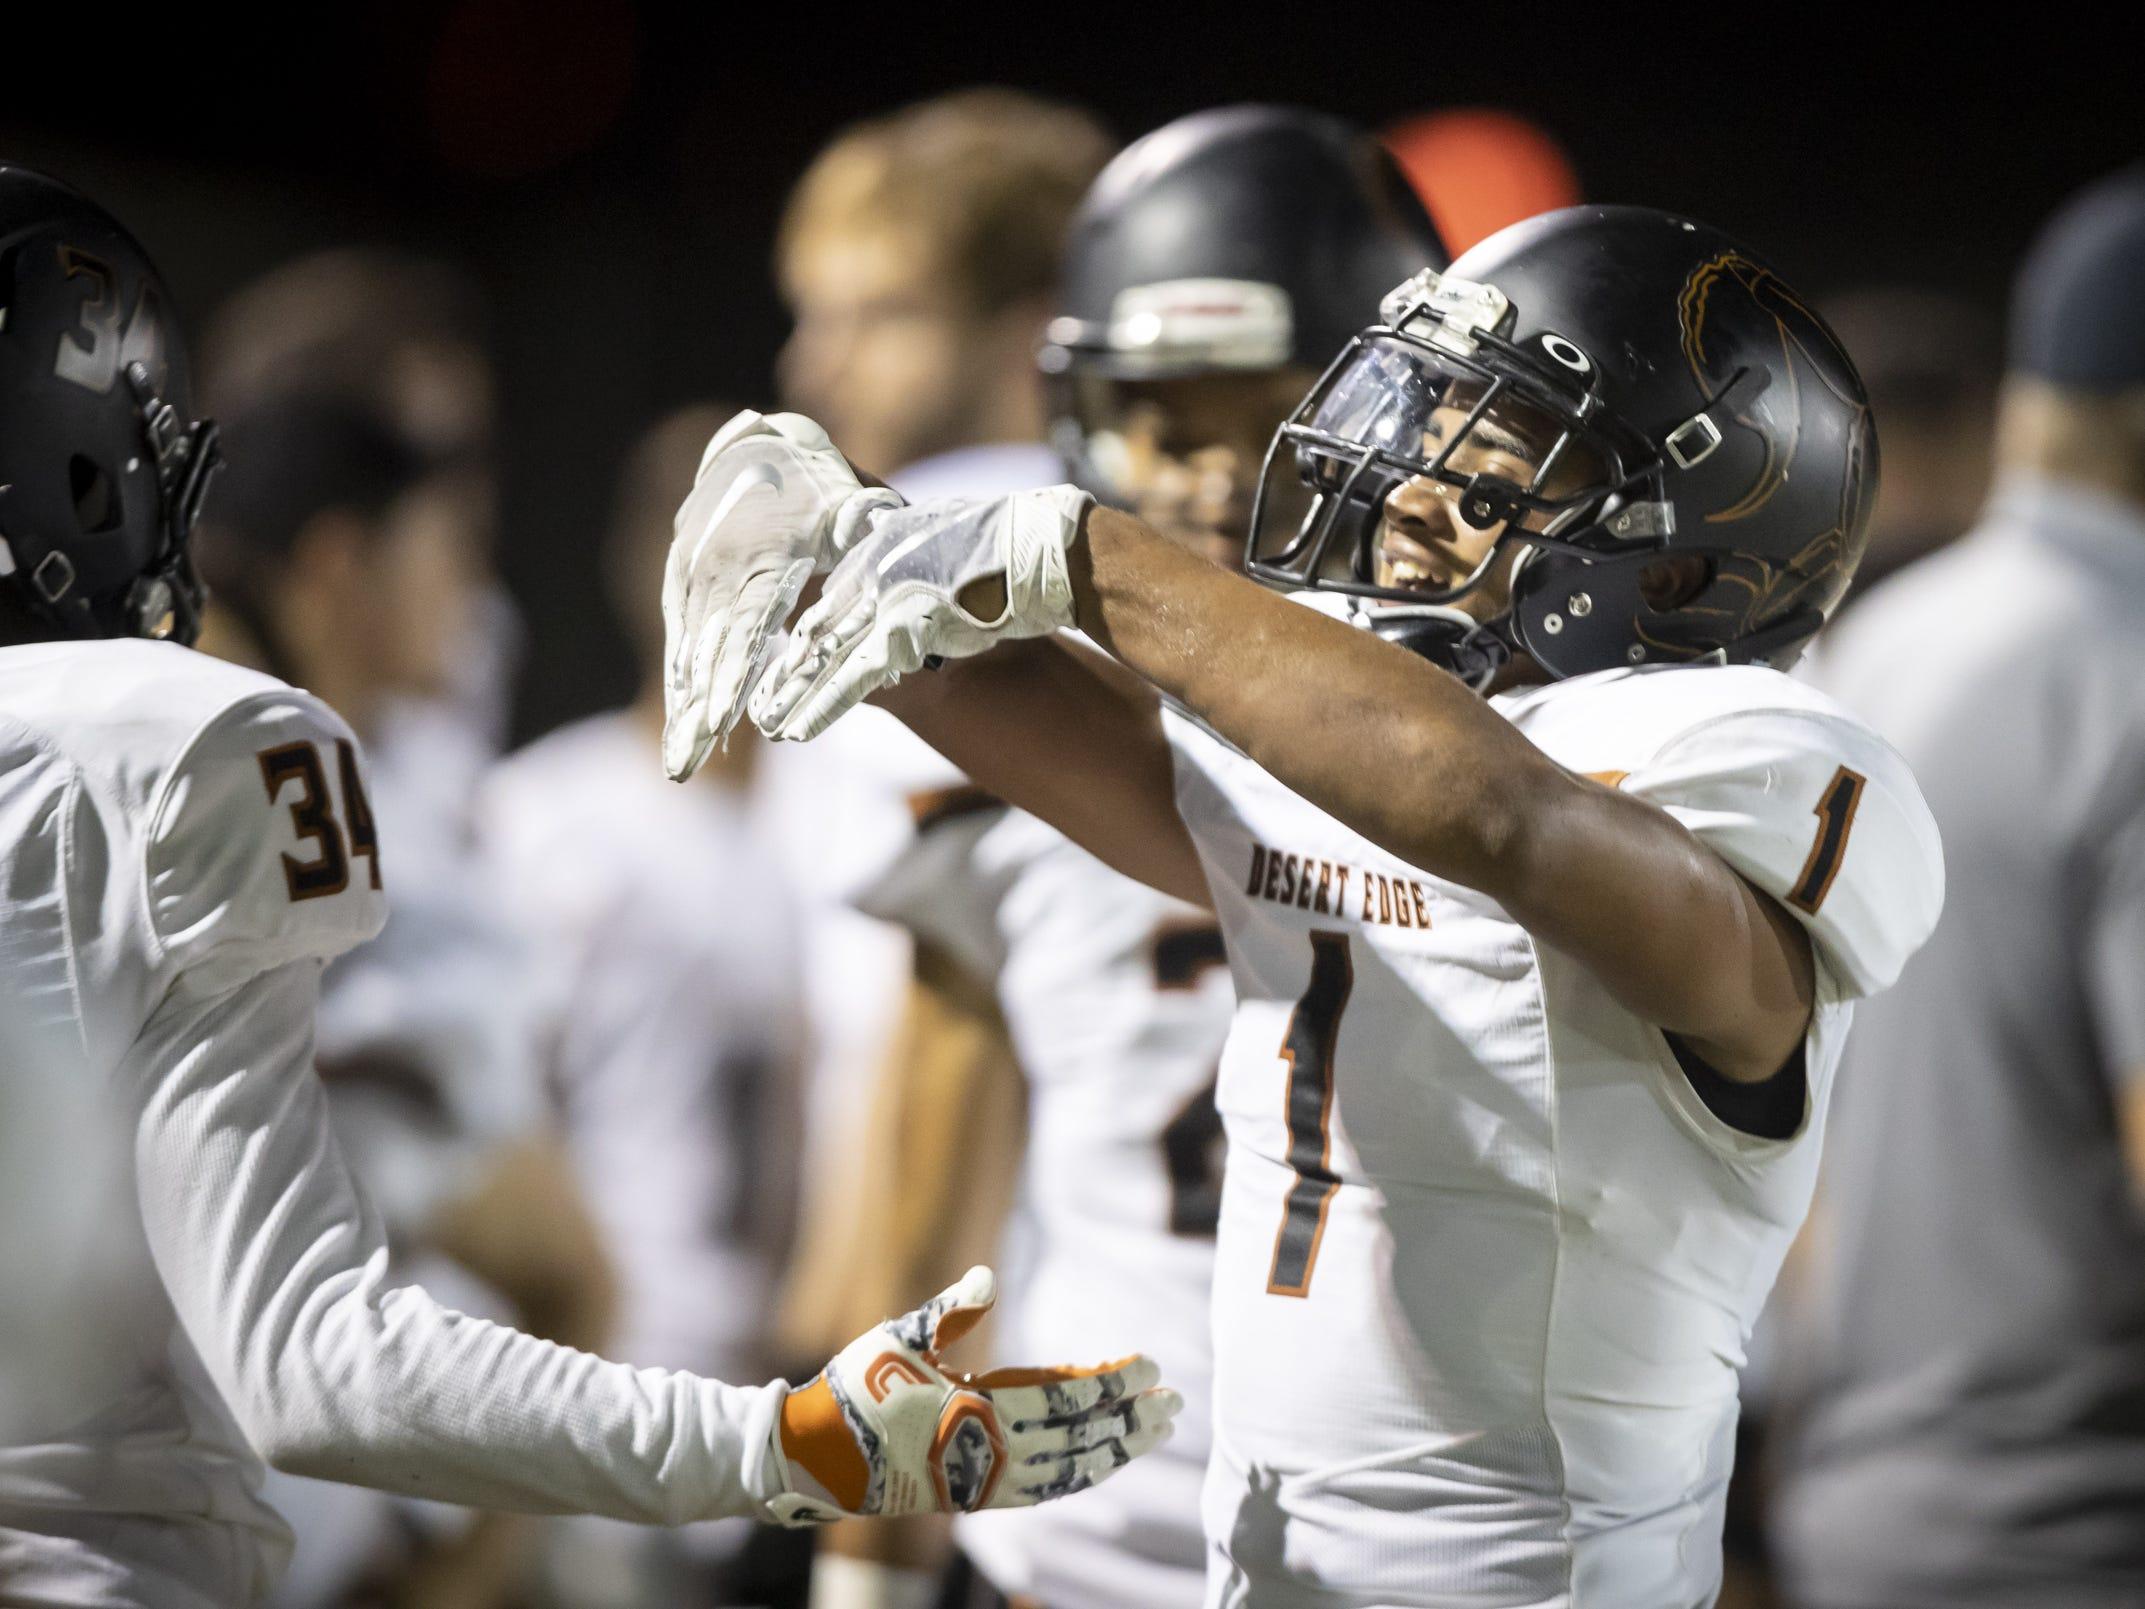 Sophomore free safety Steven Ortiz (1) of the Desert Edge Scorpions celebrates a touchdown against the Saguaro Sabercats at Saguaro High School on Friday, September 28, 2018 in Scottsdale, Arizona. #azhsfb